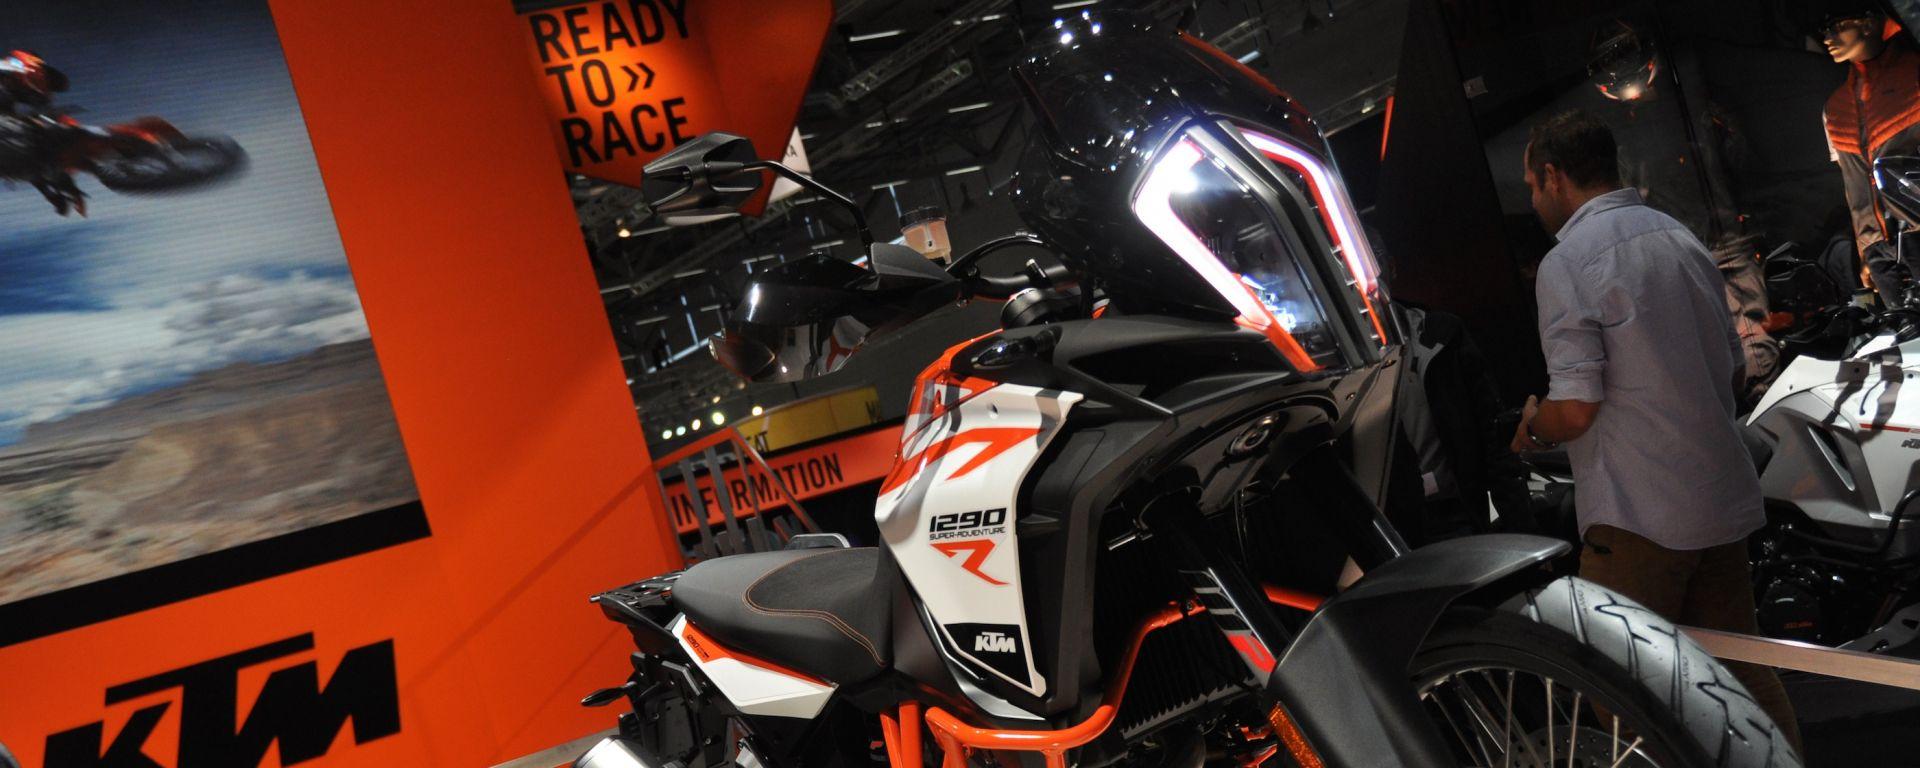 Intermot 2016: KTM 1290 Super Adventure R, S e T, le ammiraglie arancioni - MotorBox